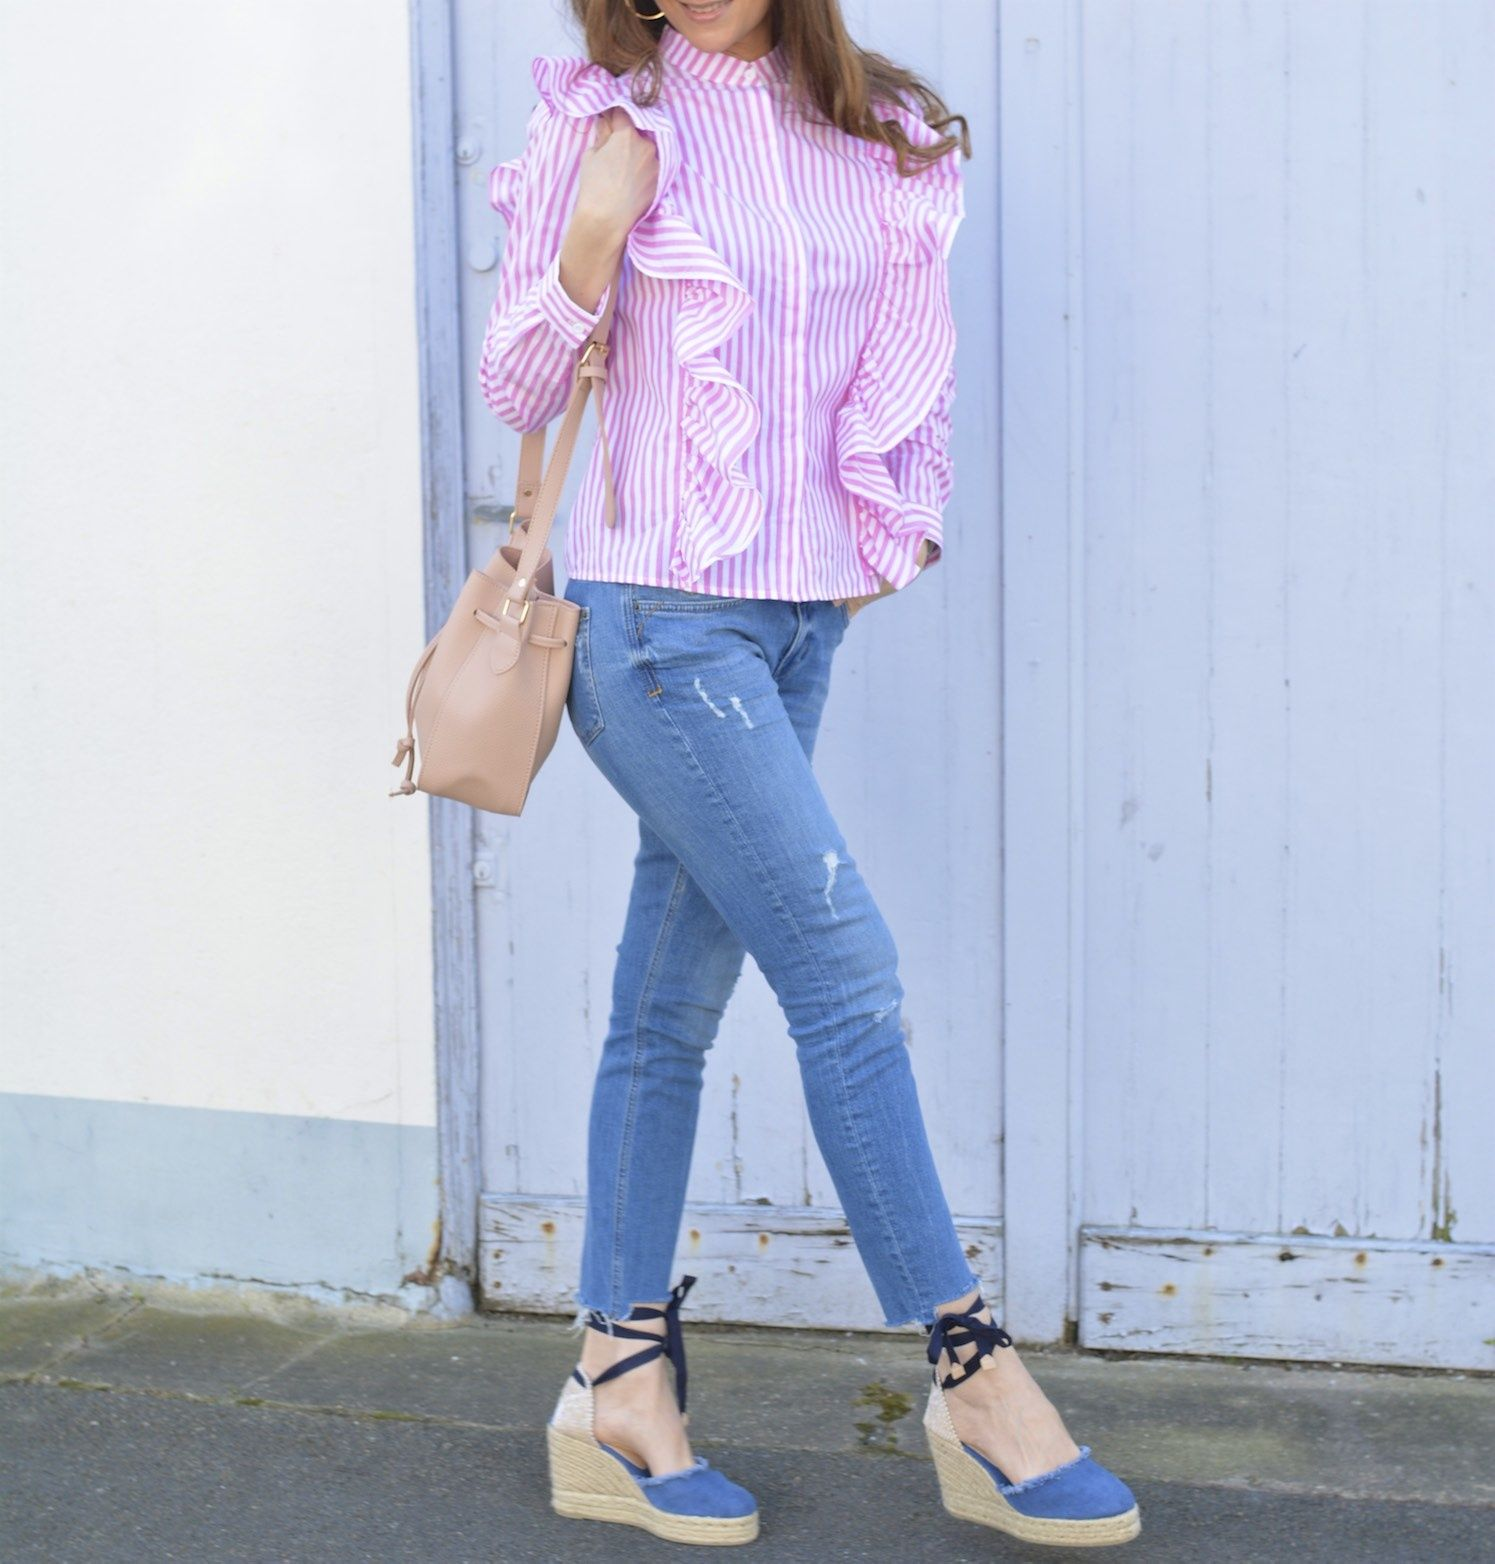 Pink stripes #style #blouse #Chemisier #volant #tendances #rayures #stripes #tenuedujour #lookdujou #SoFrenchByNaty #casual #castaner #castañer #espadrilles #bohochic #outfit #look #pink #alpargatas #candy